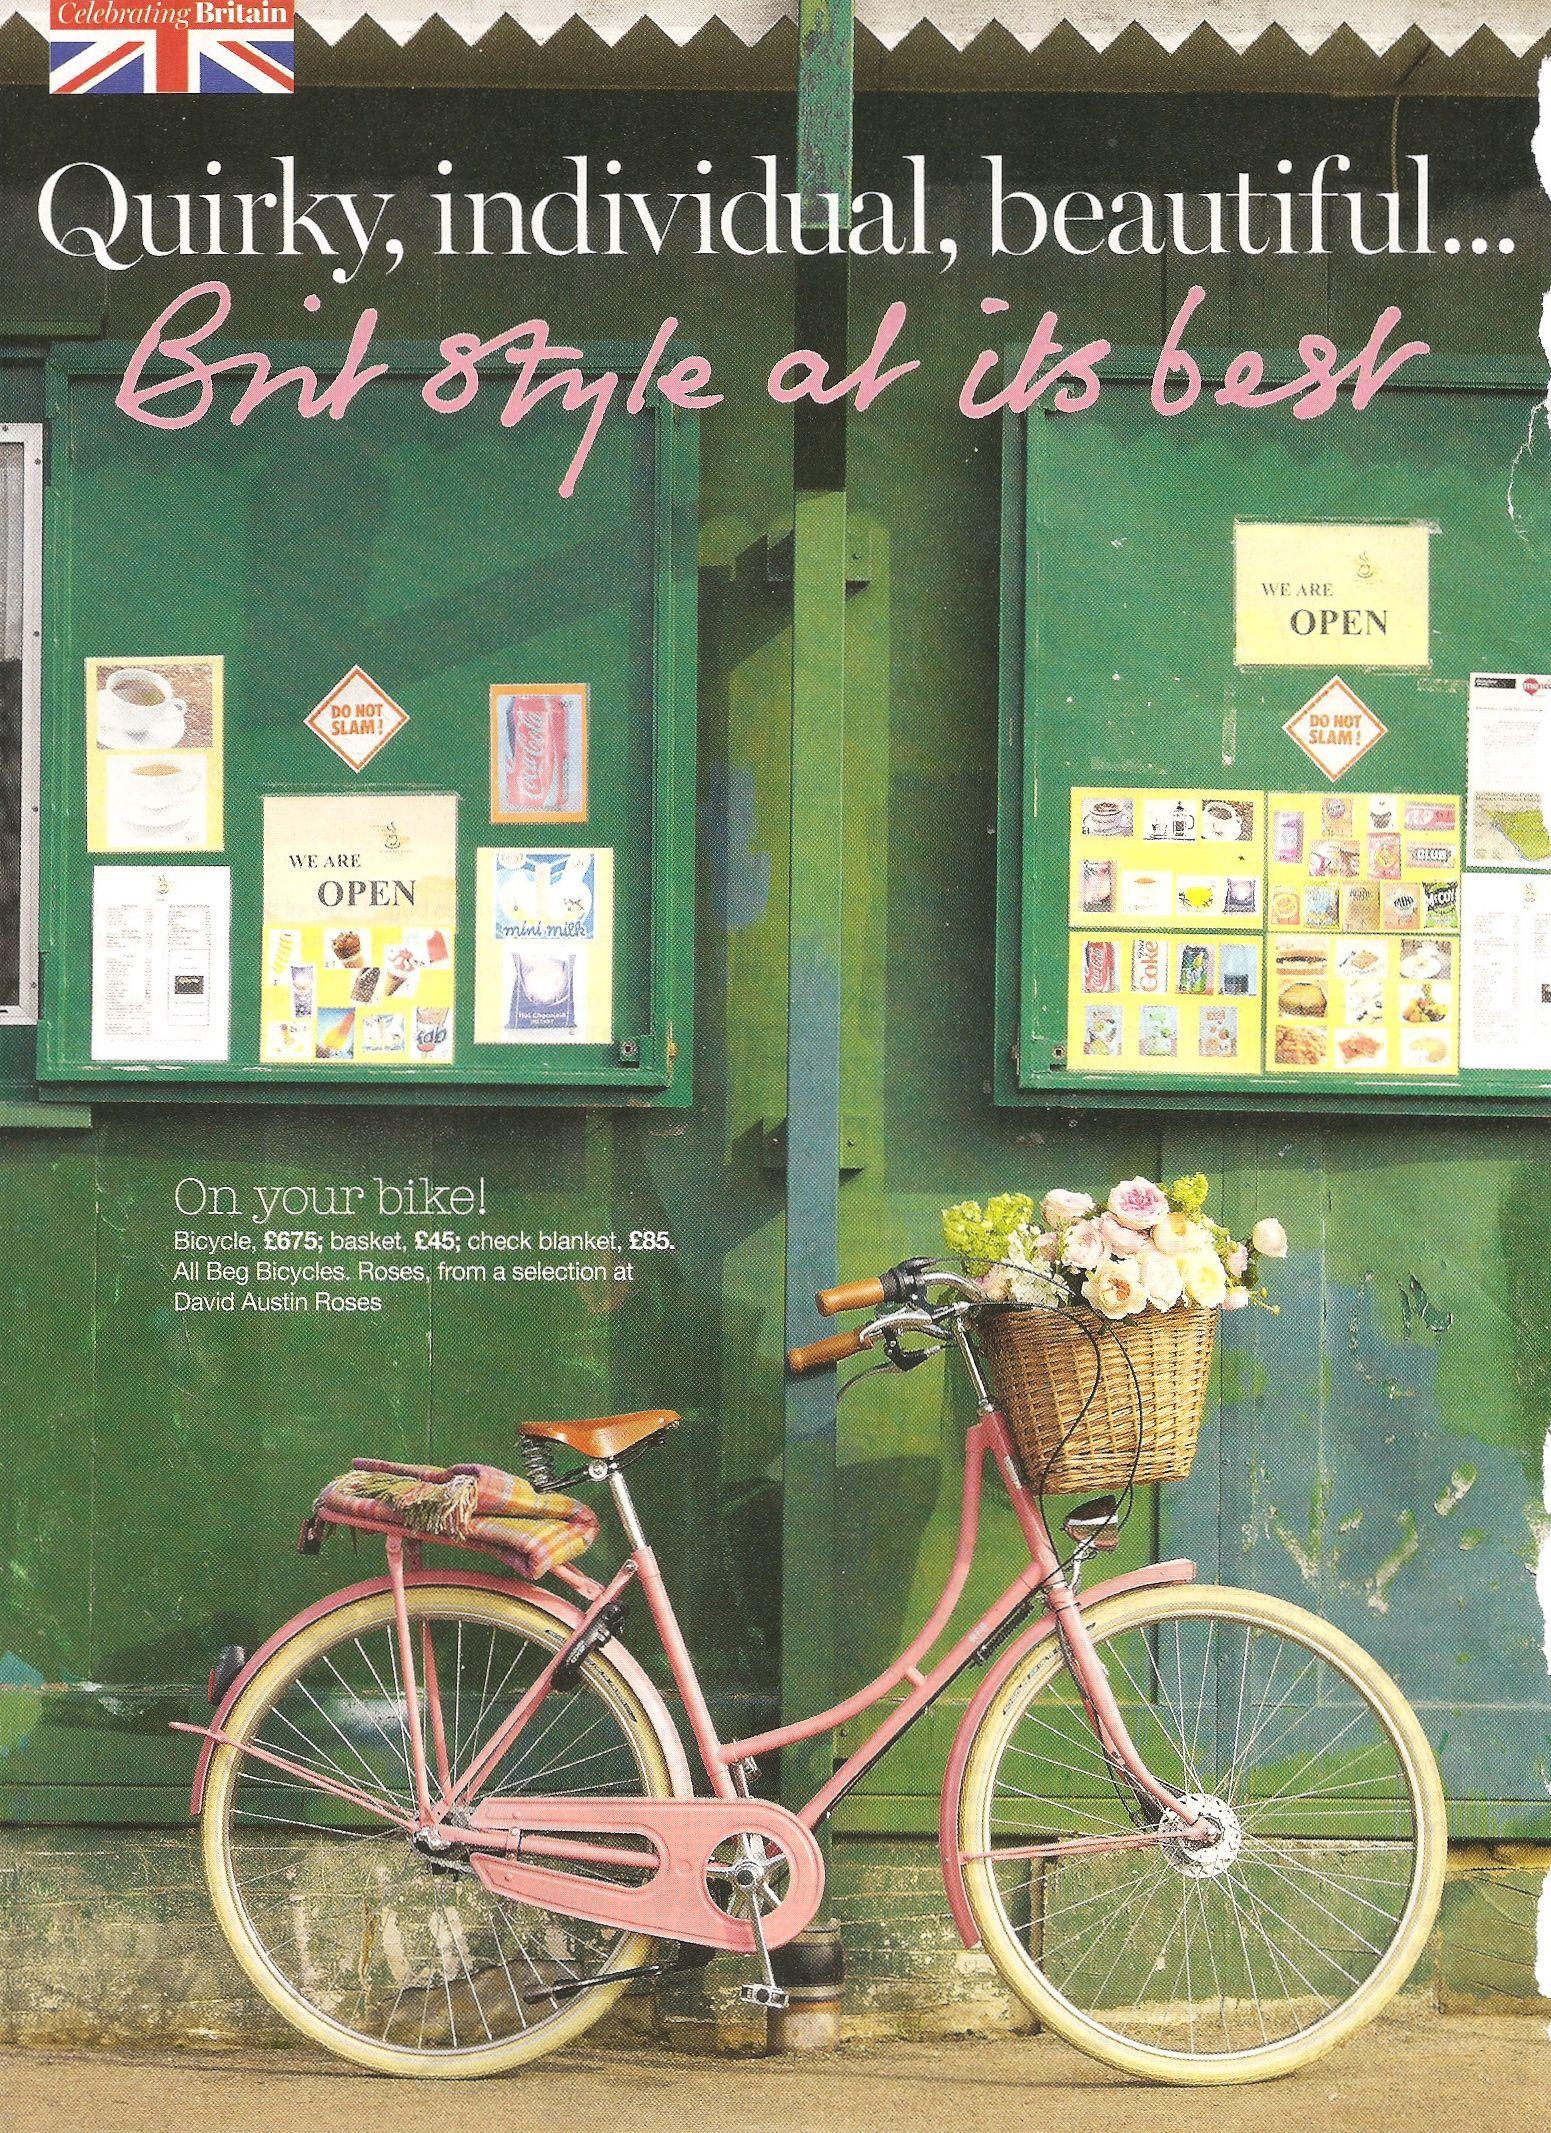 Prima Beg Bicycles Dutch bicycles